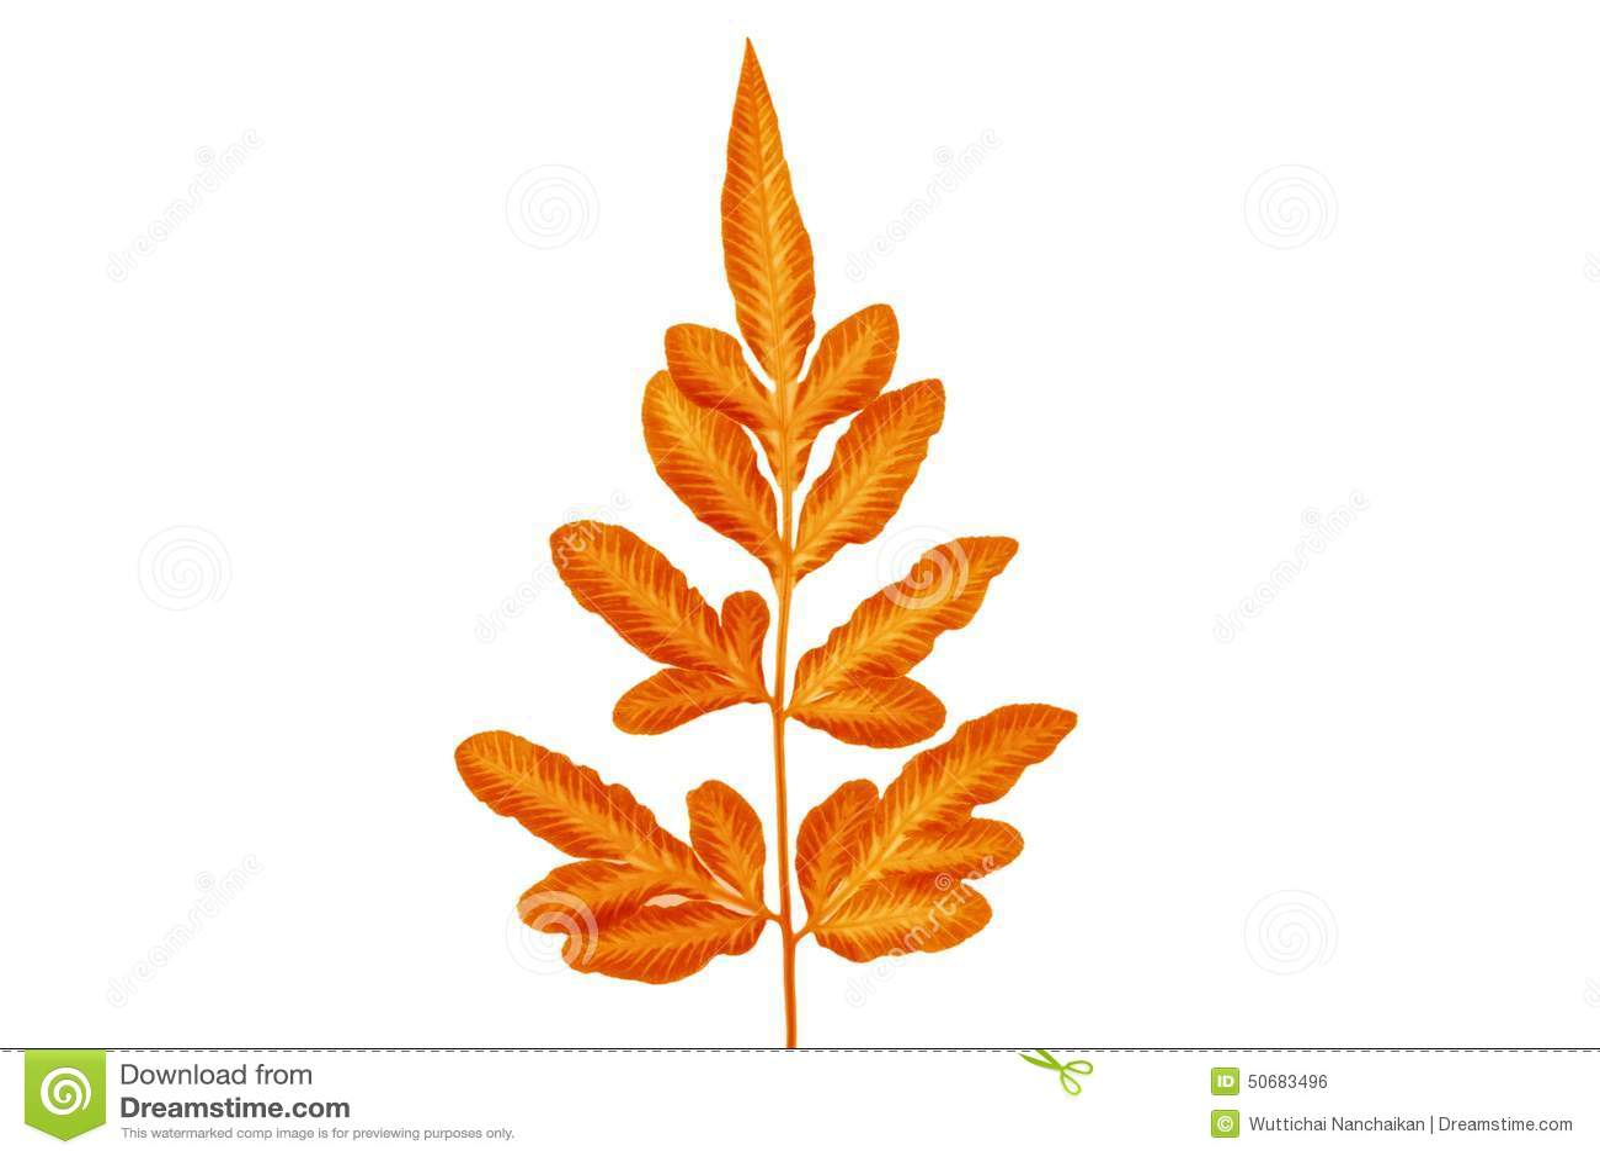 Download 橙黄色叶子 库存照片. 图片 包括有 森林, 特写镜头, 照亮, 工厂, 自动驾驶仪, 夏天, 设计, 自然 - 50683496